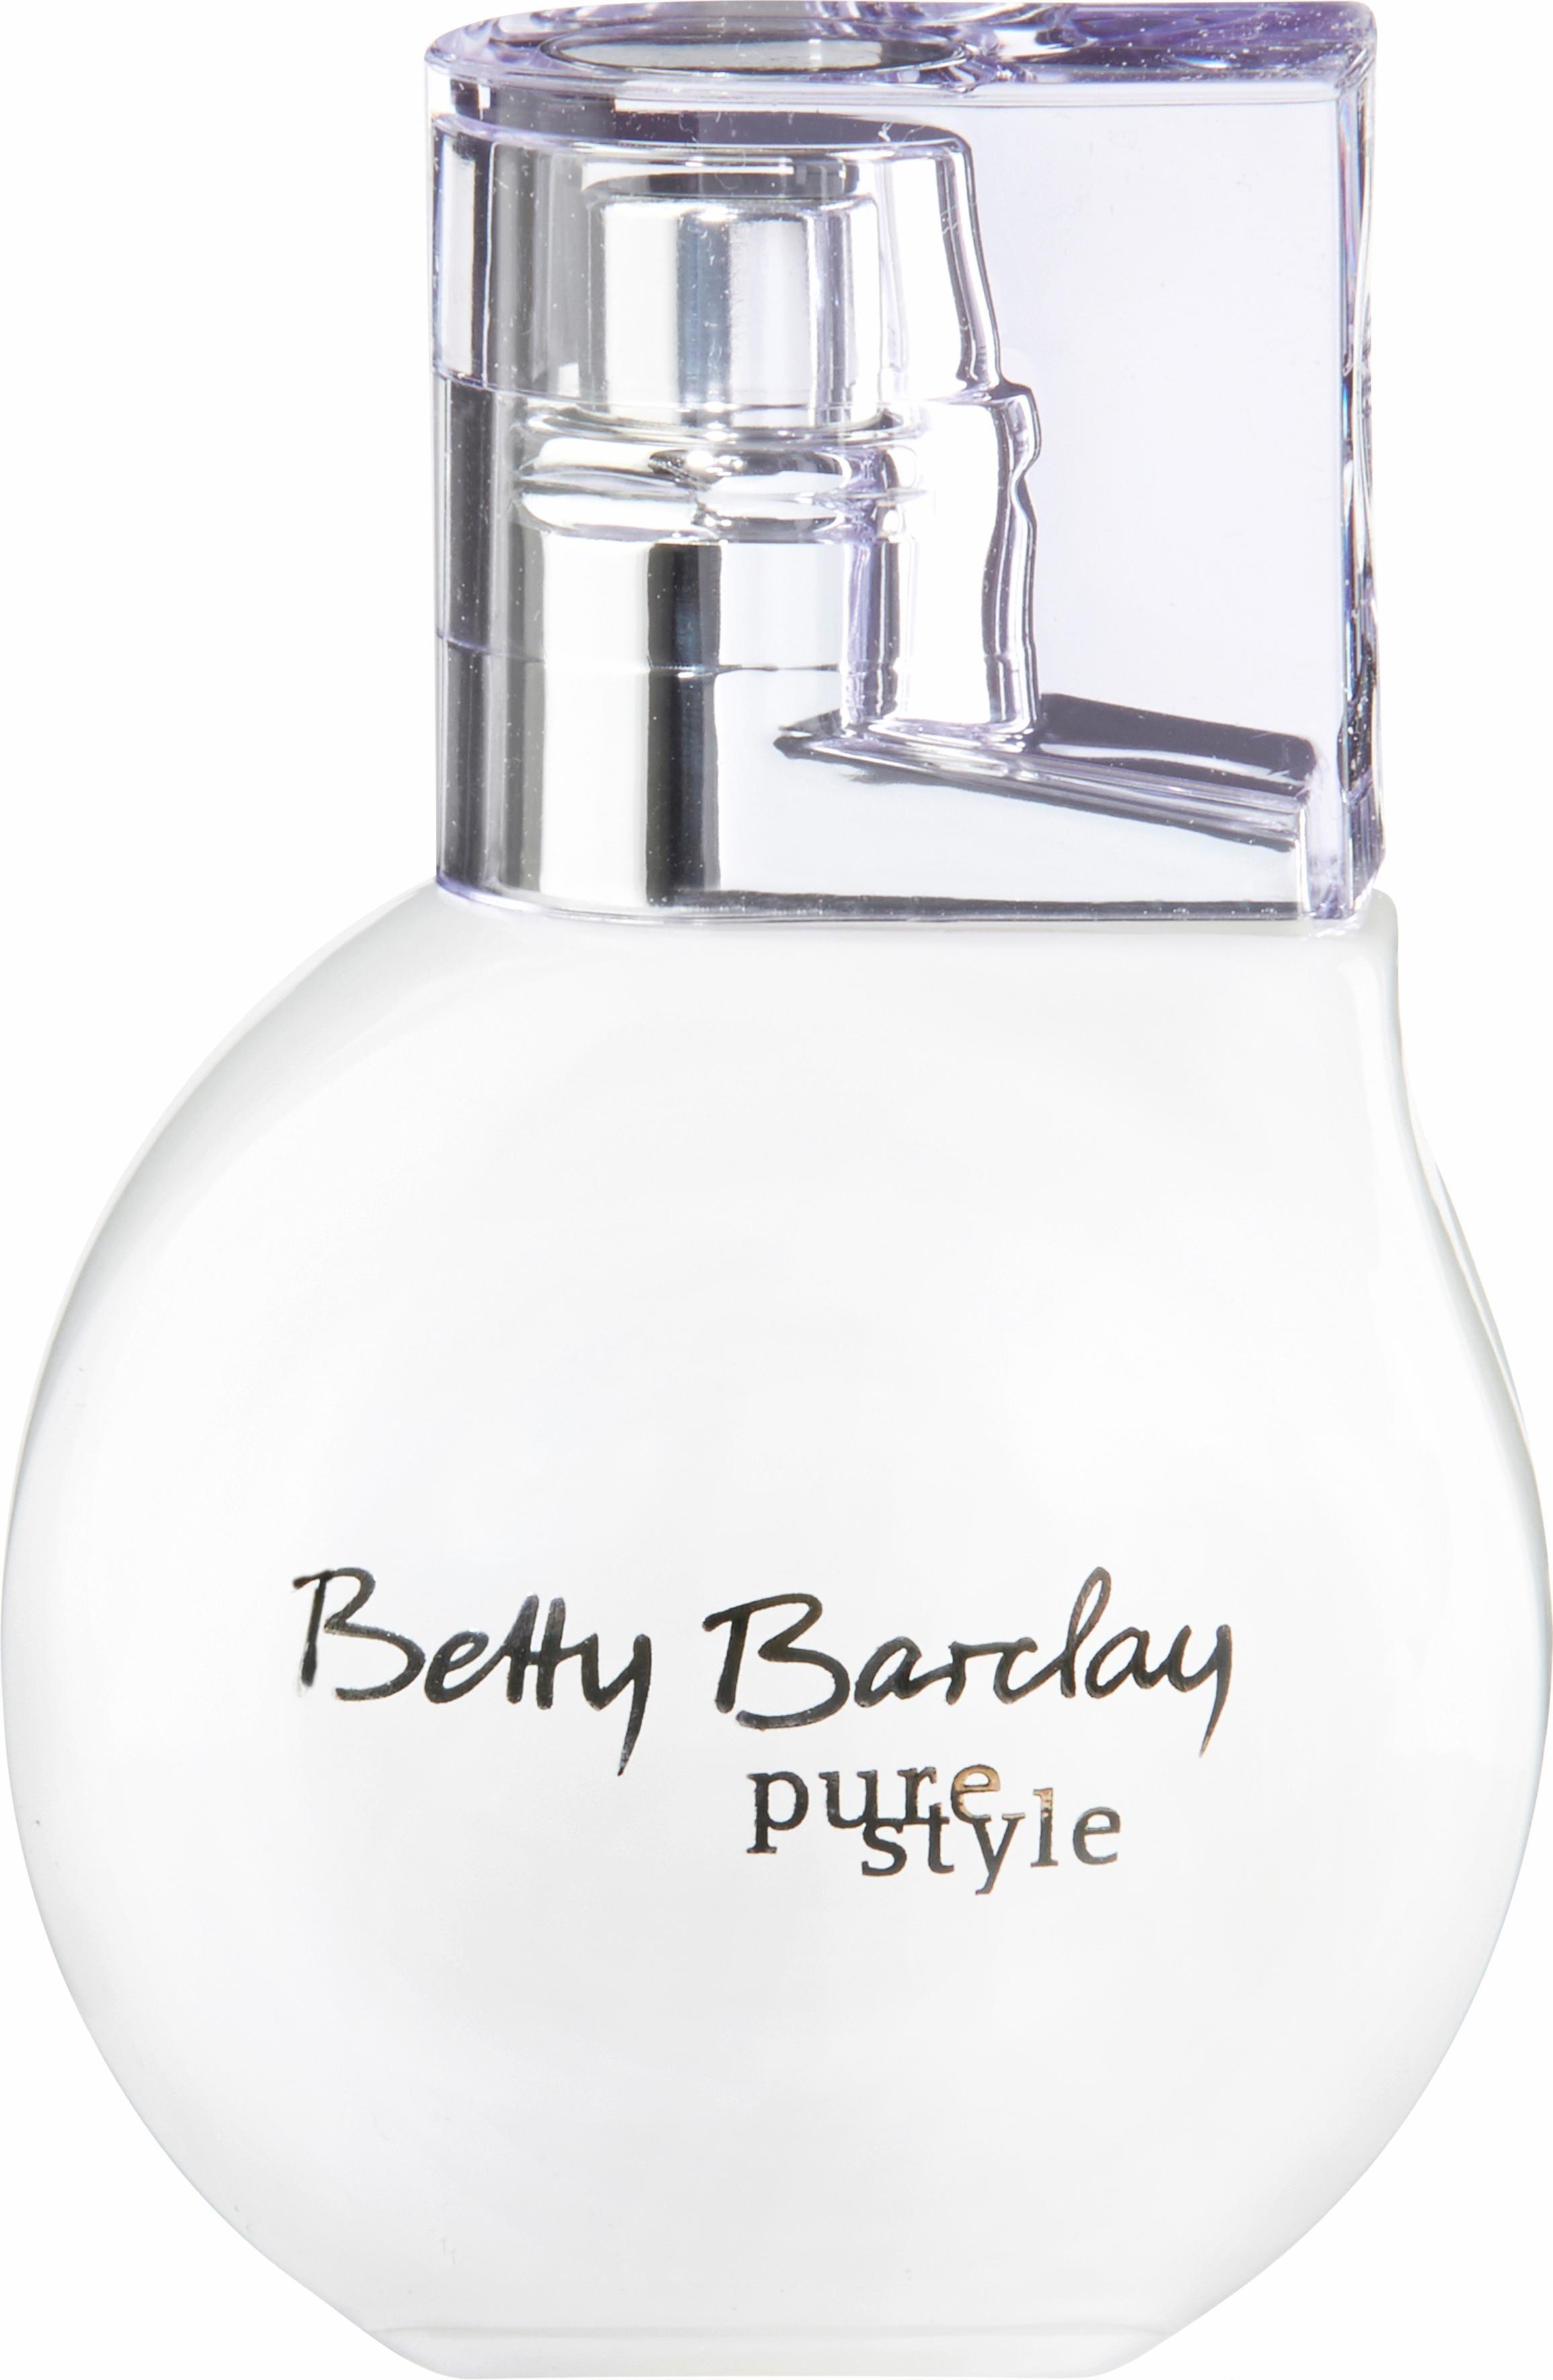 Eau de Toilette, Betty Barclay, »pure style« bestellen | BAUR